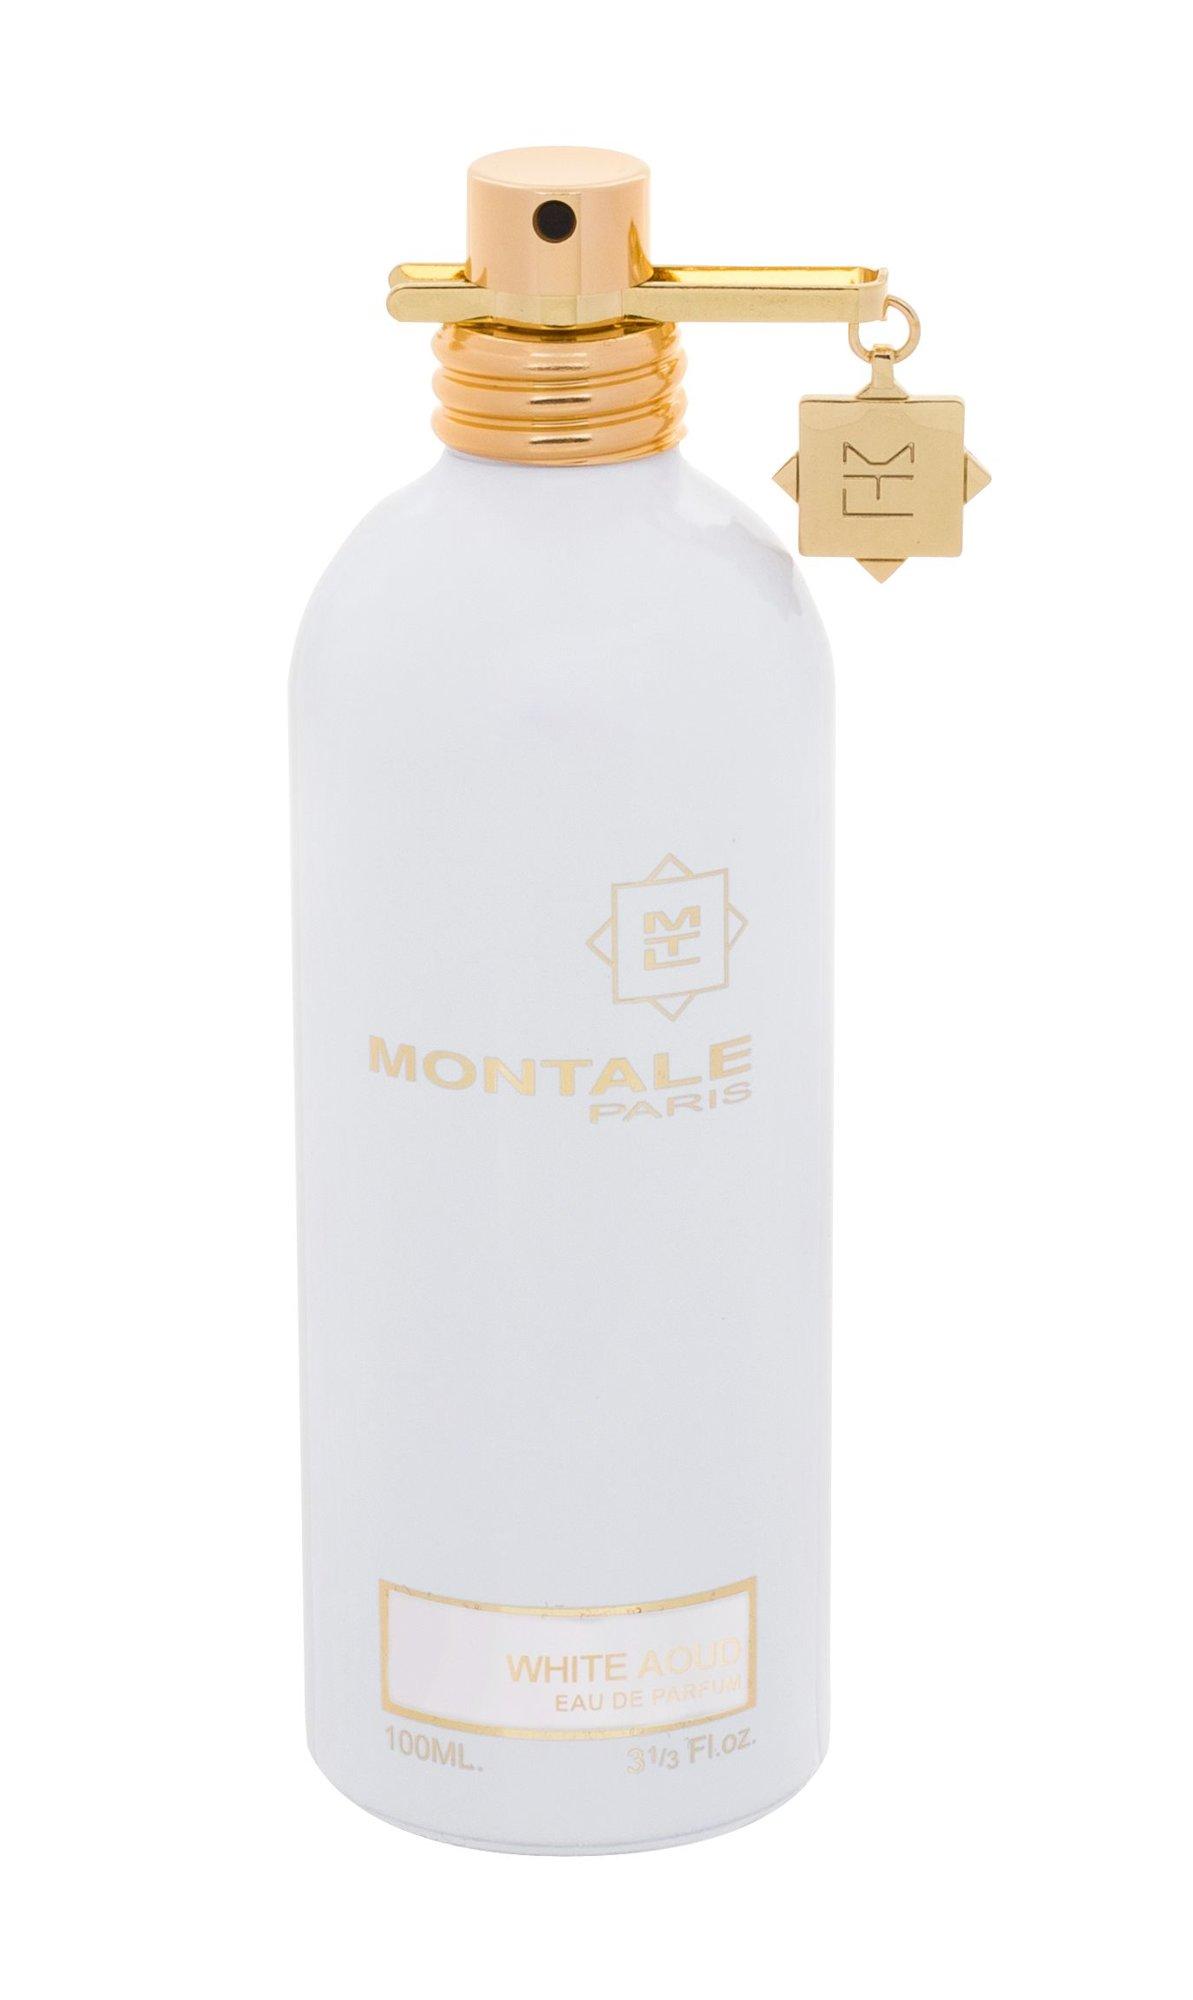 Montale Paris White Aoud EDP 100ml